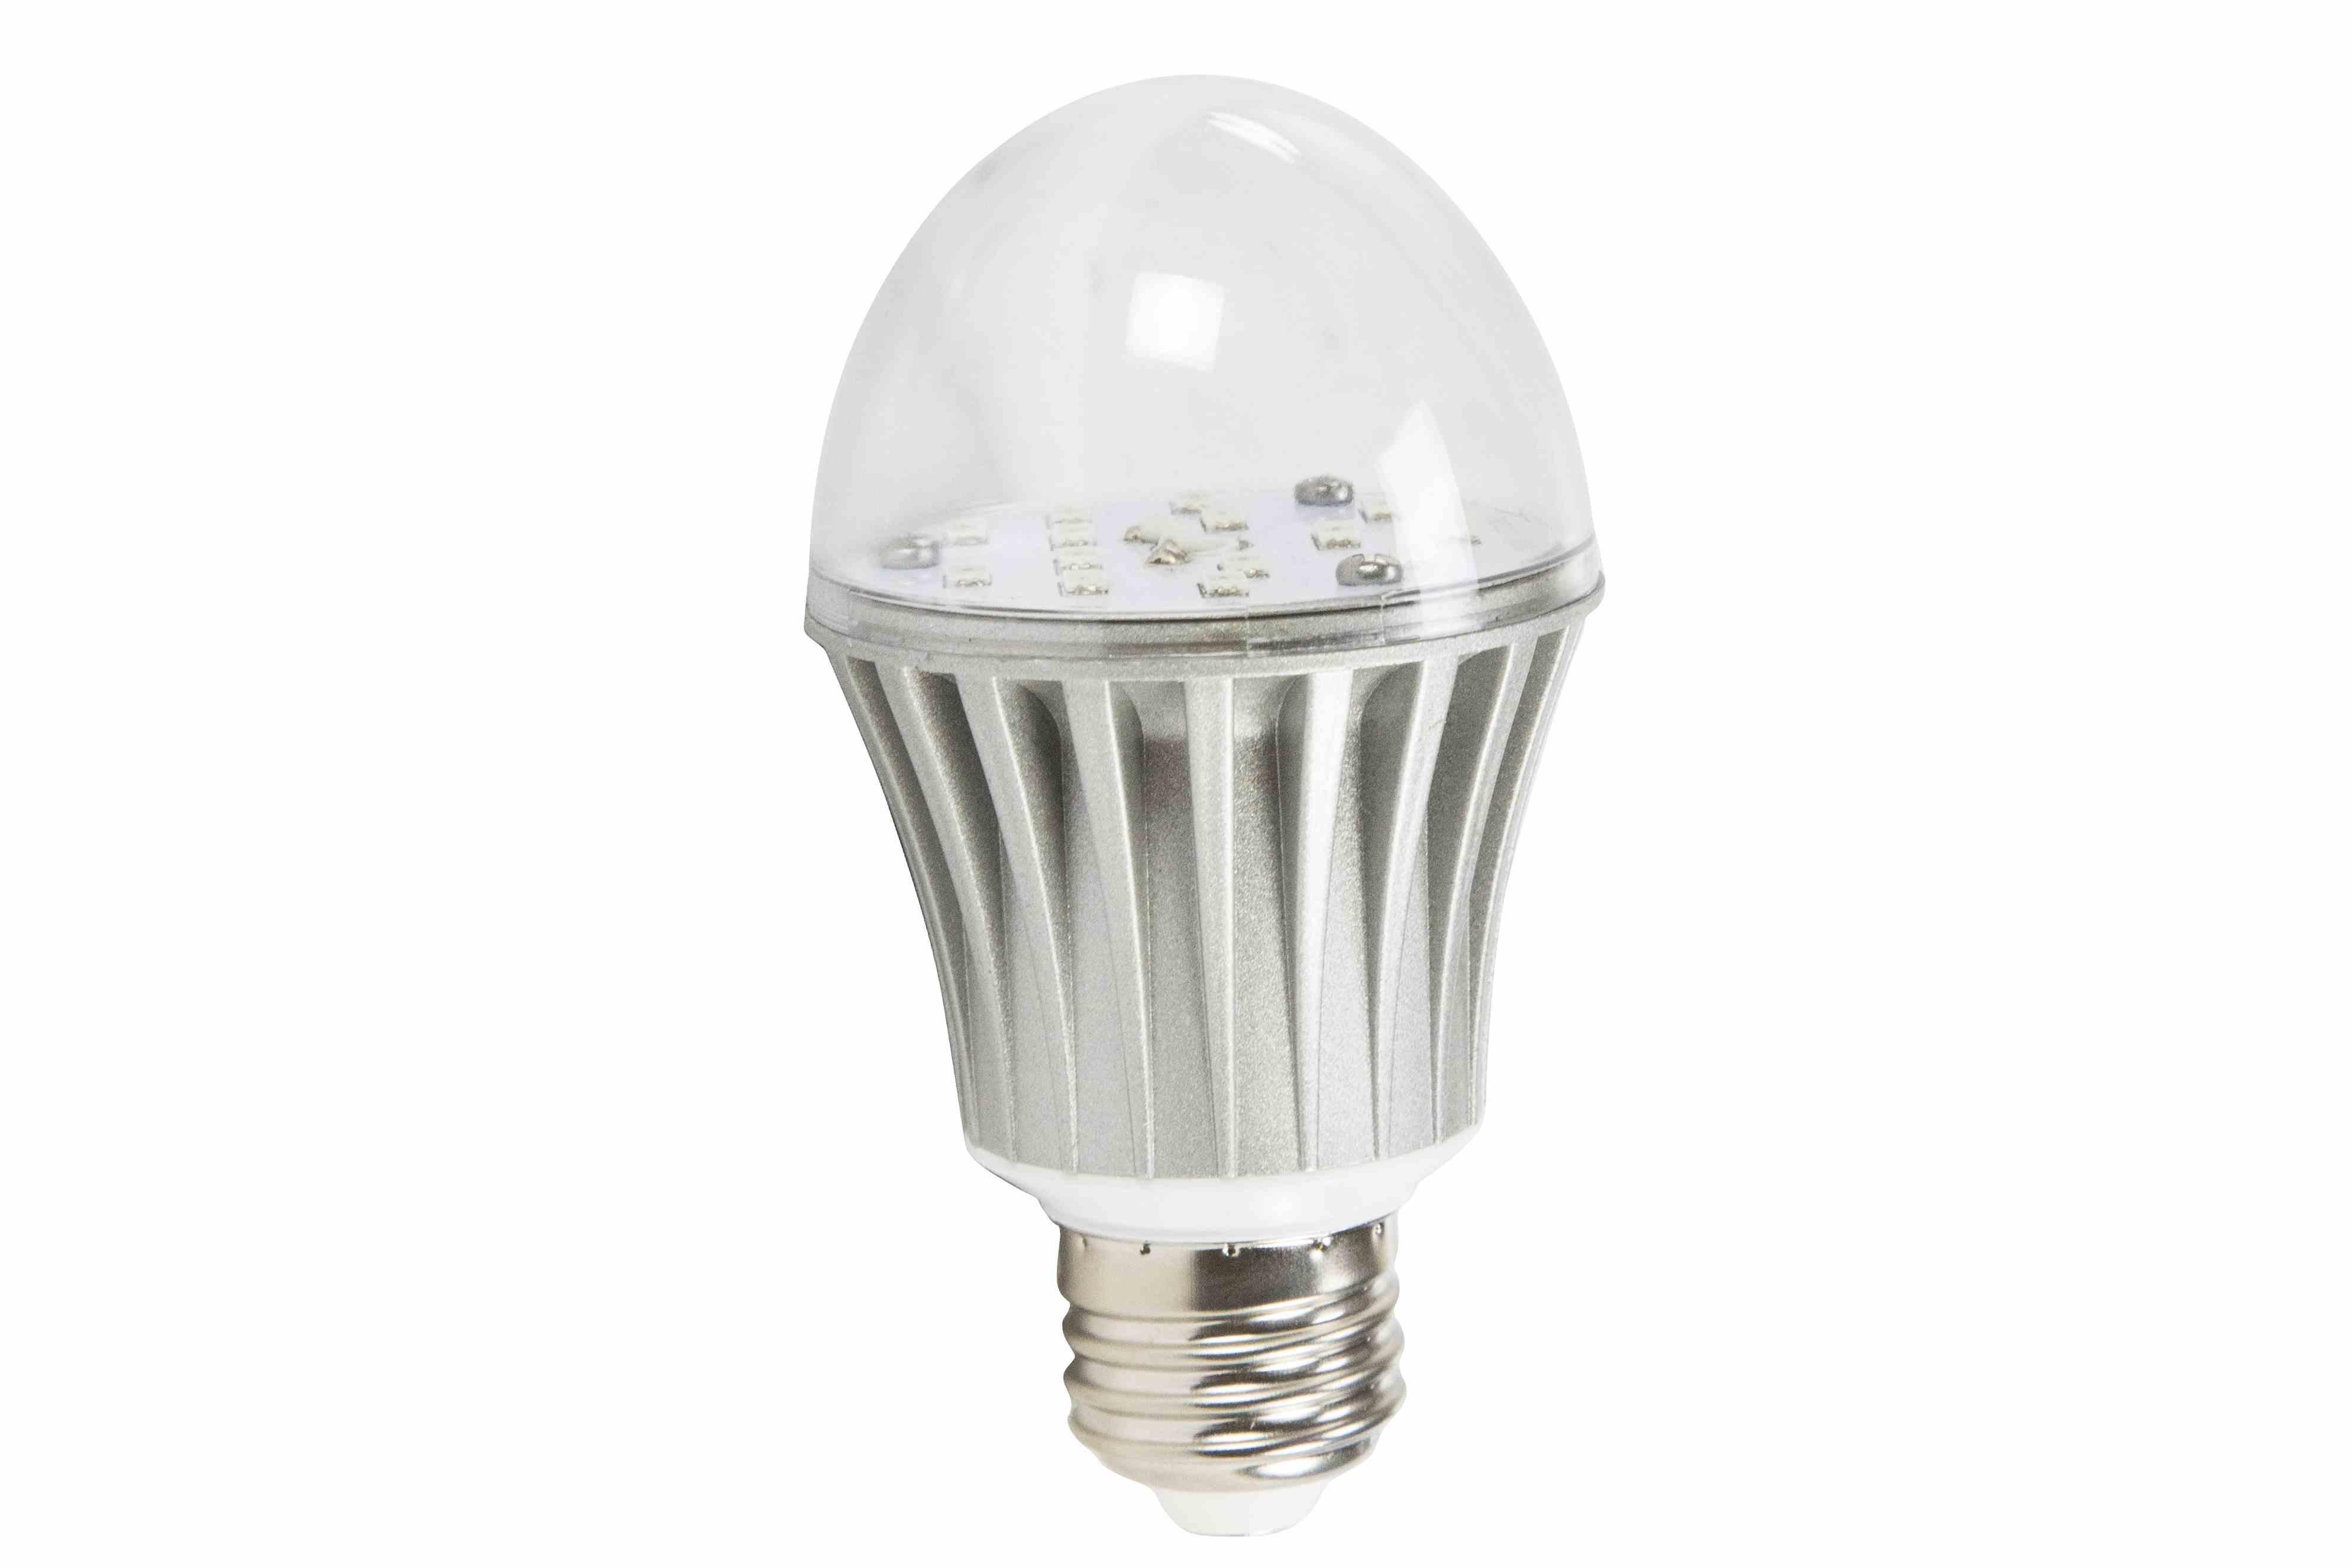 5 watt led light bulb a19 style replacement for 60 watt incandescent e26 li. Black Bedroom Furniture Sets. Home Design Ideas